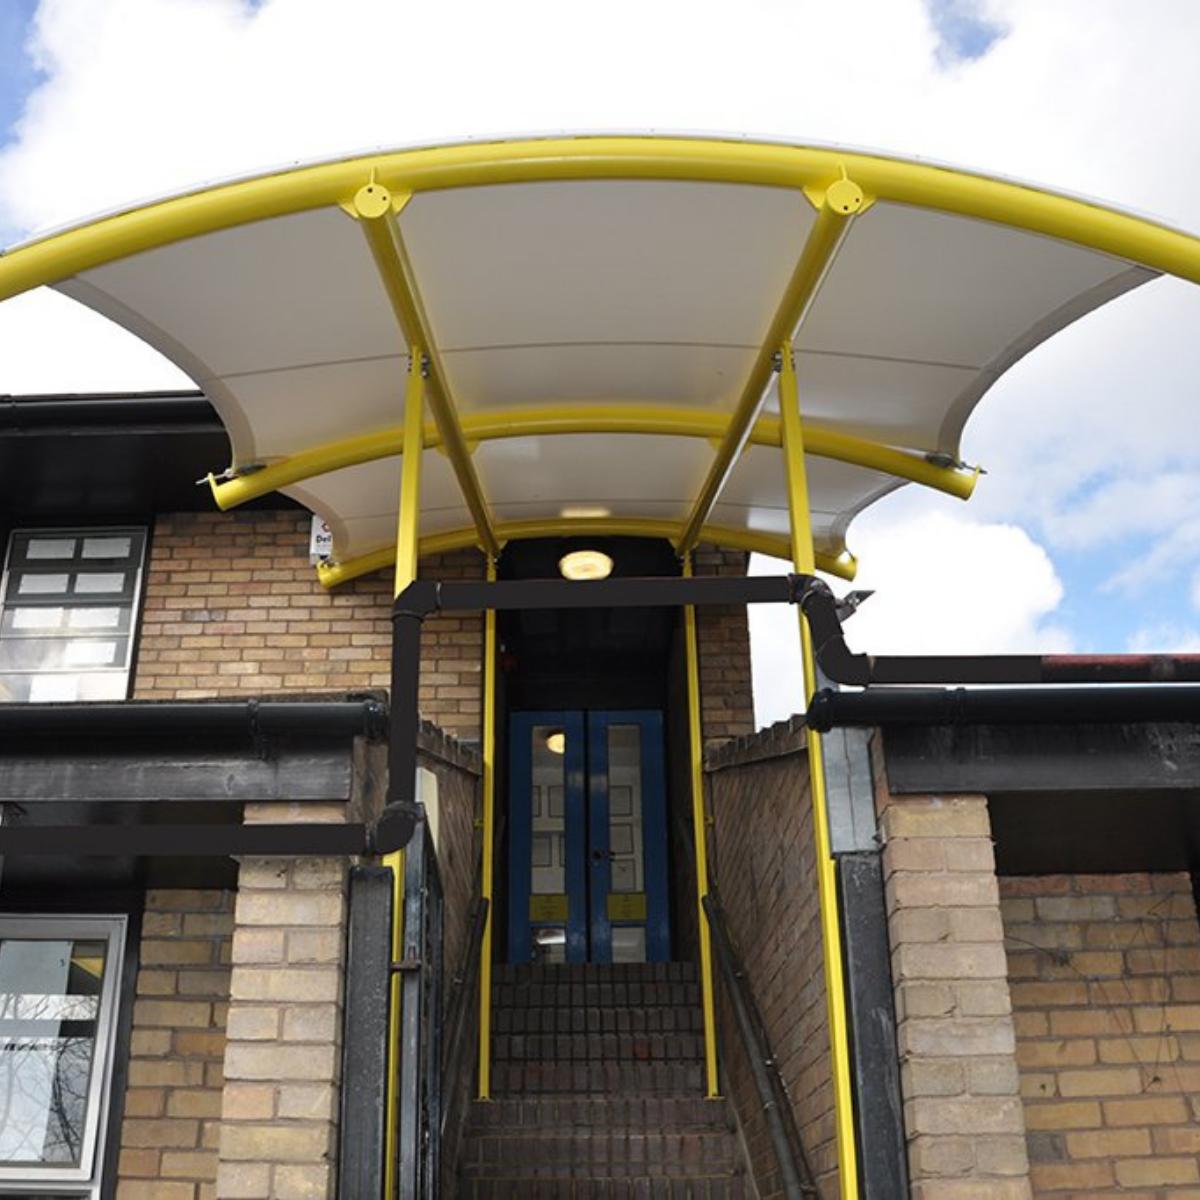 Havelock Entrance Canopy